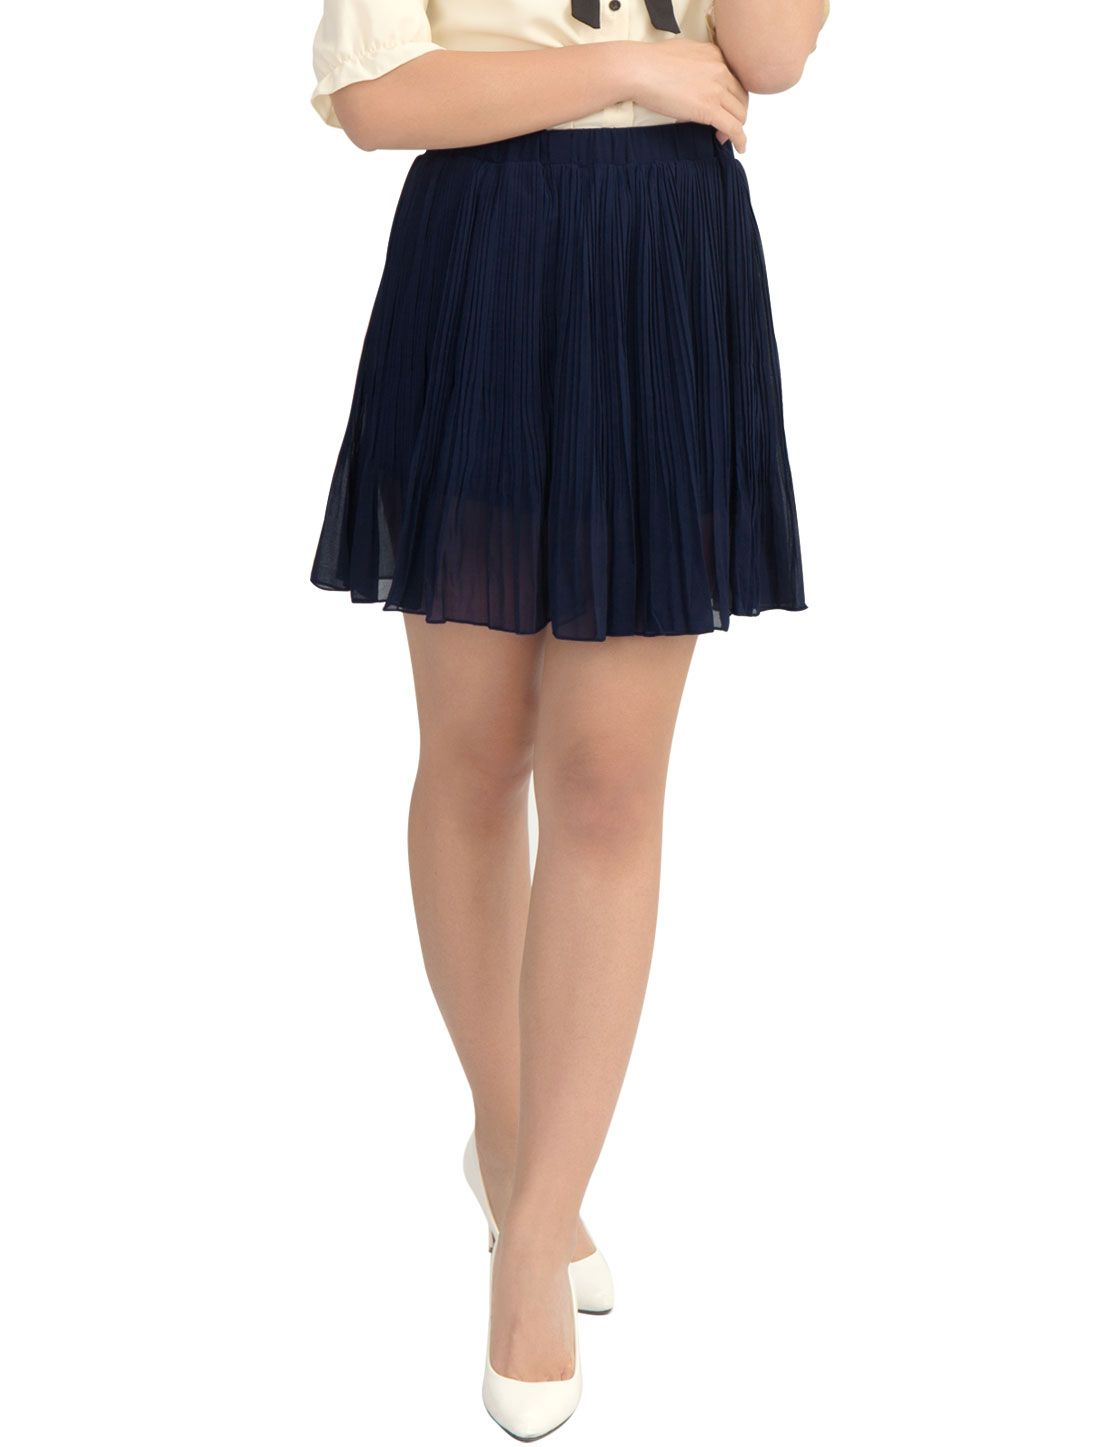 6e6705936 Women's Summer Cinched Waist Chiffon Pleated Mini Skirt Black (Size M / 10)  Black